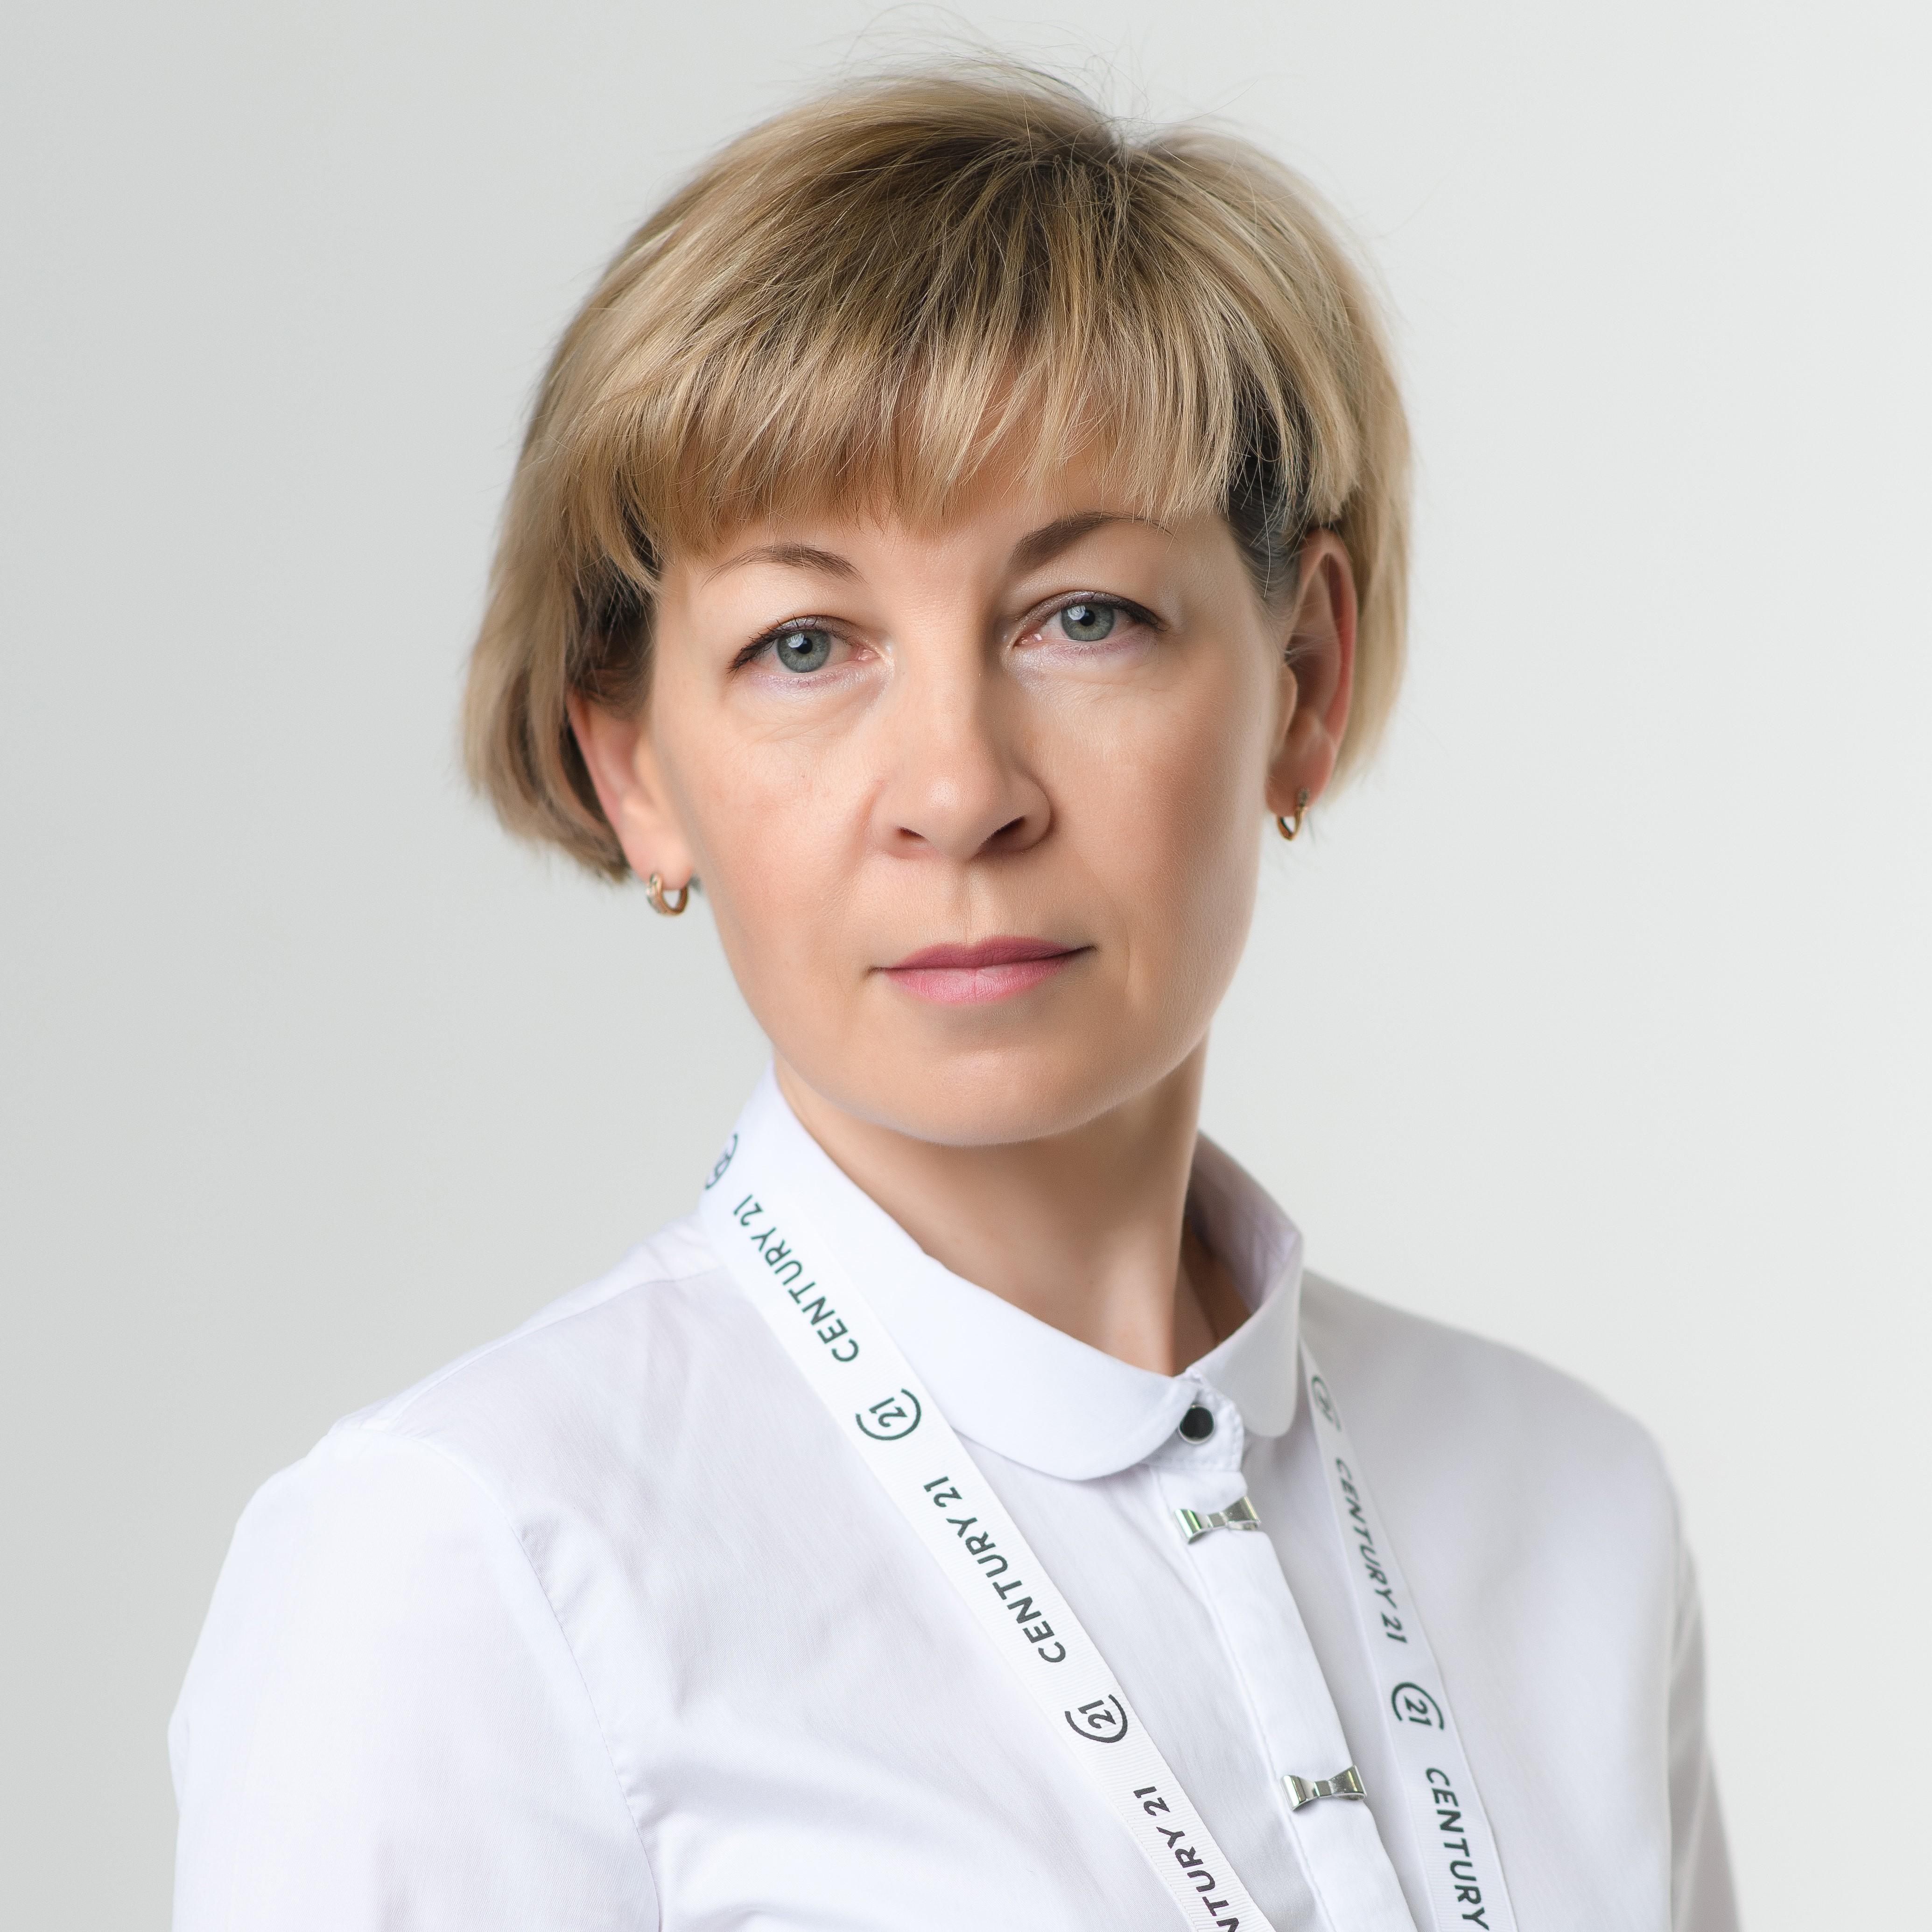 Гофман Эльвира